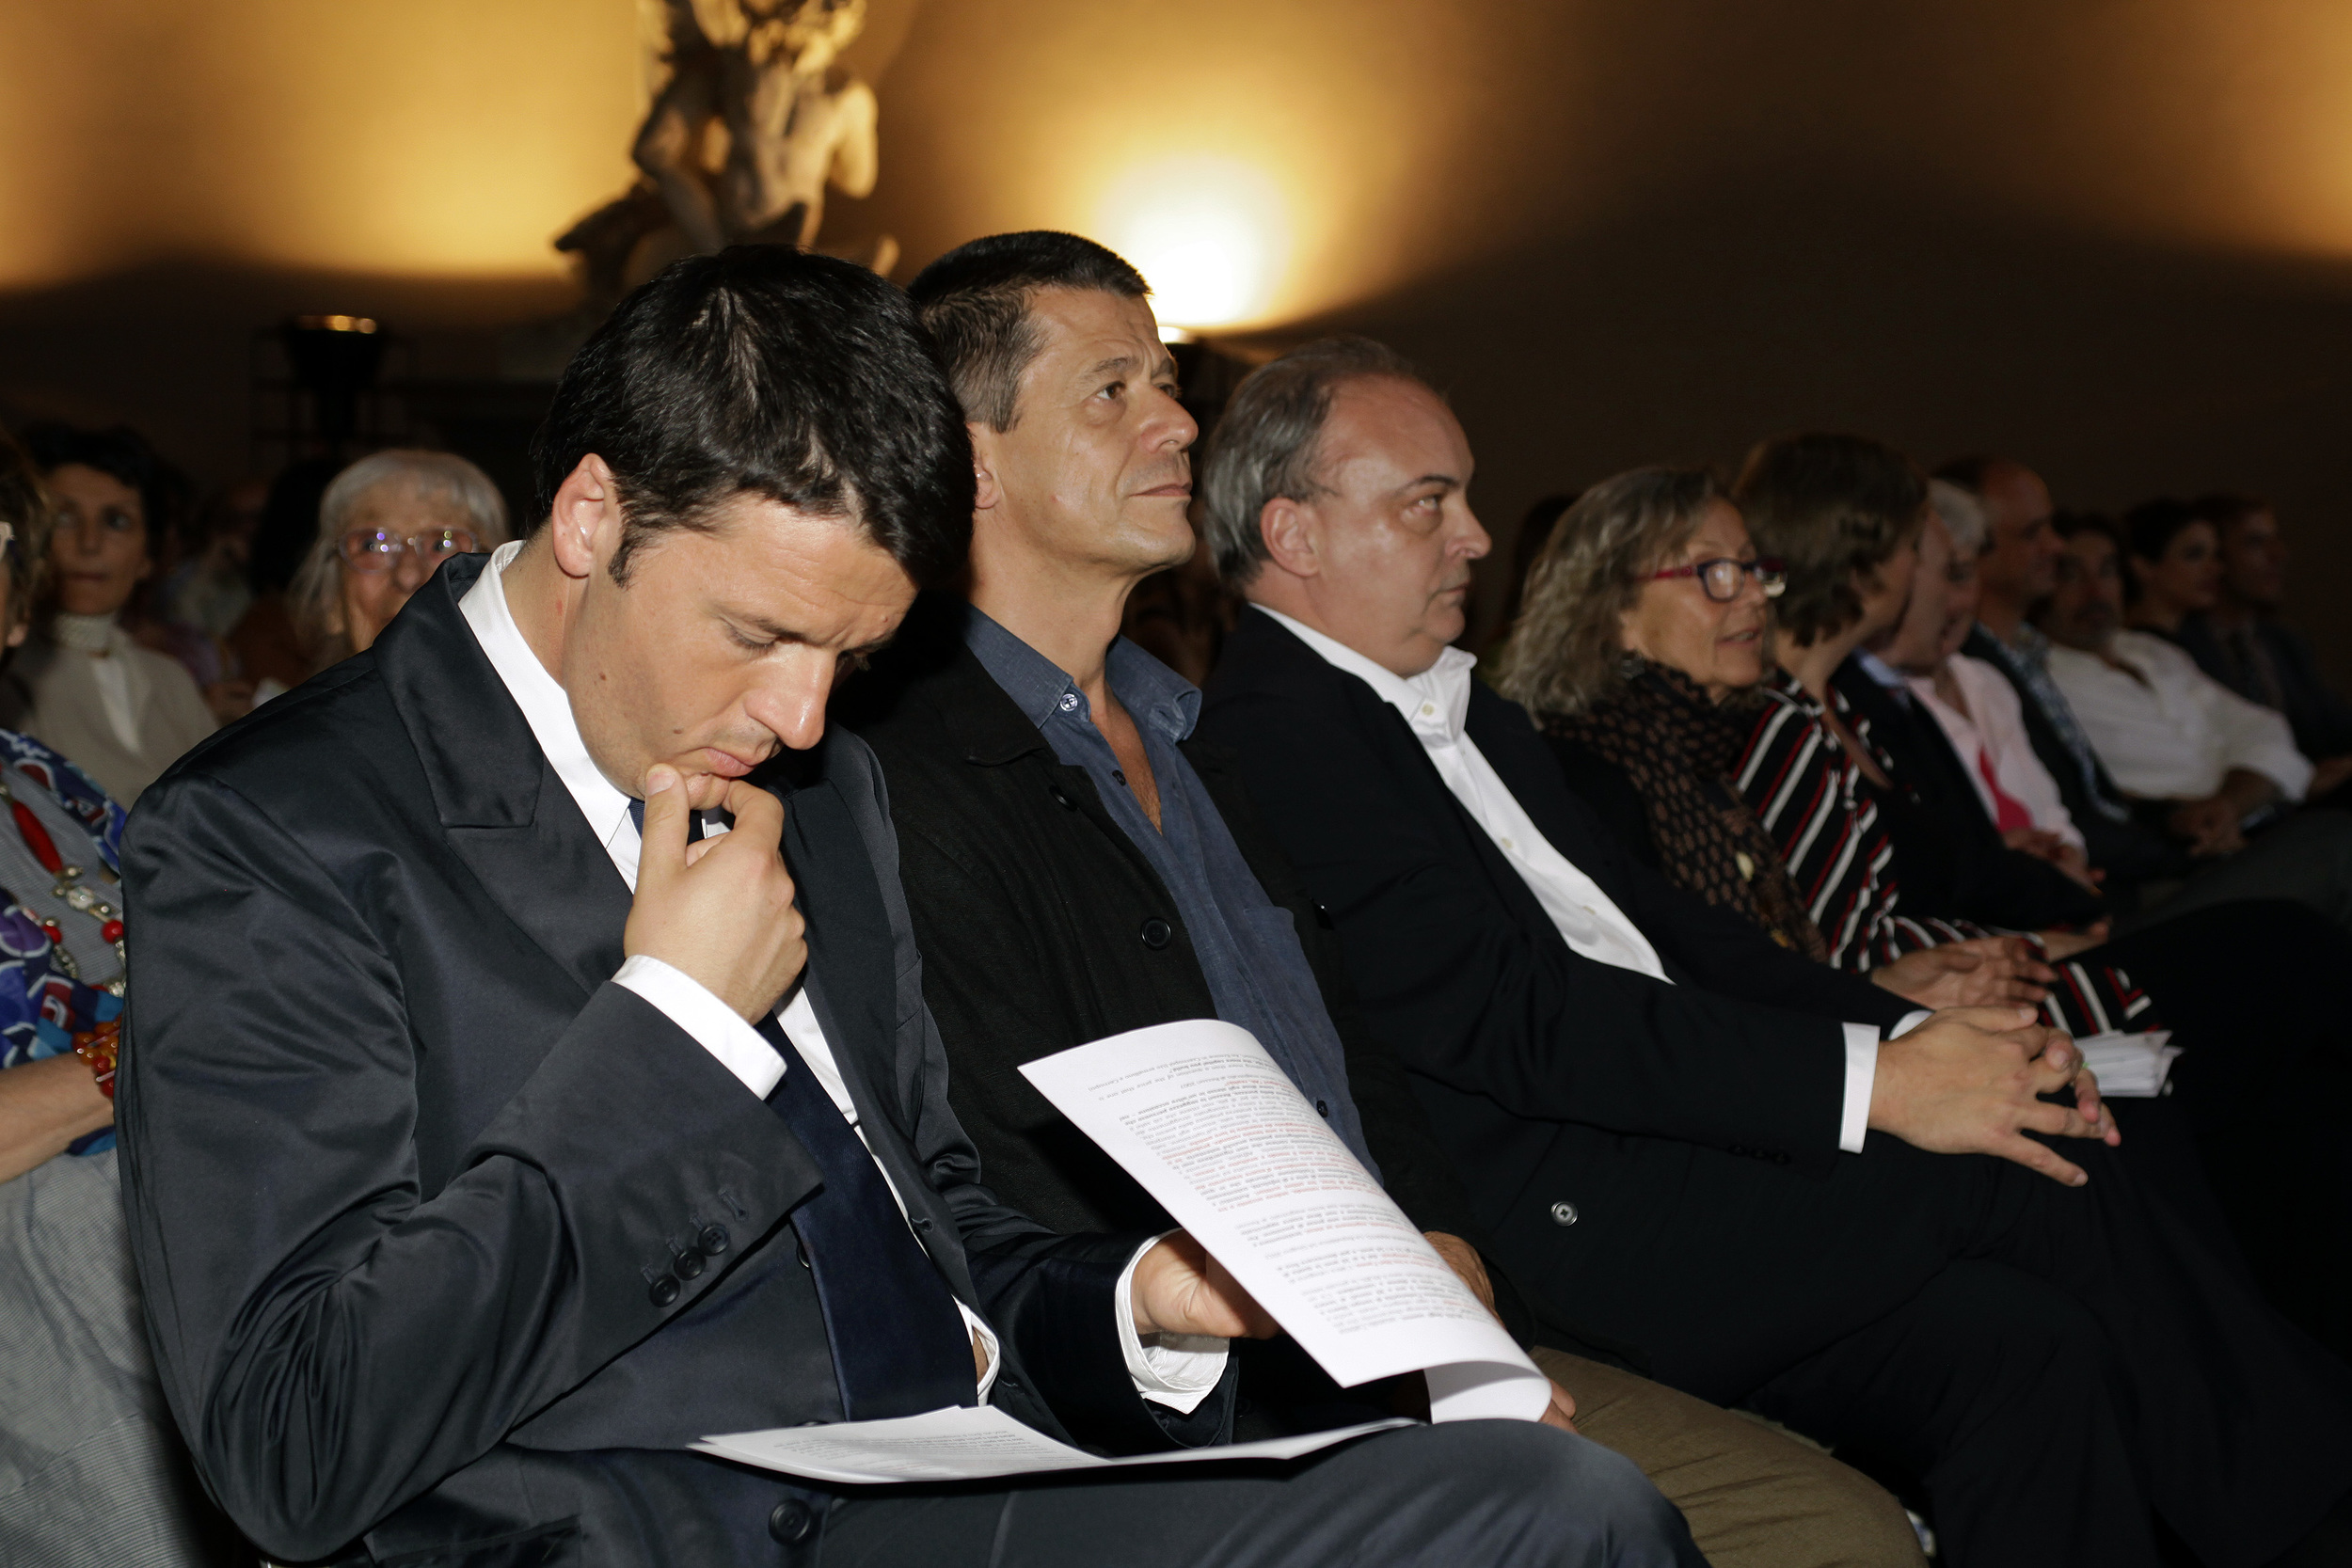 Matteo Renzi alla cerimonia di premiazione